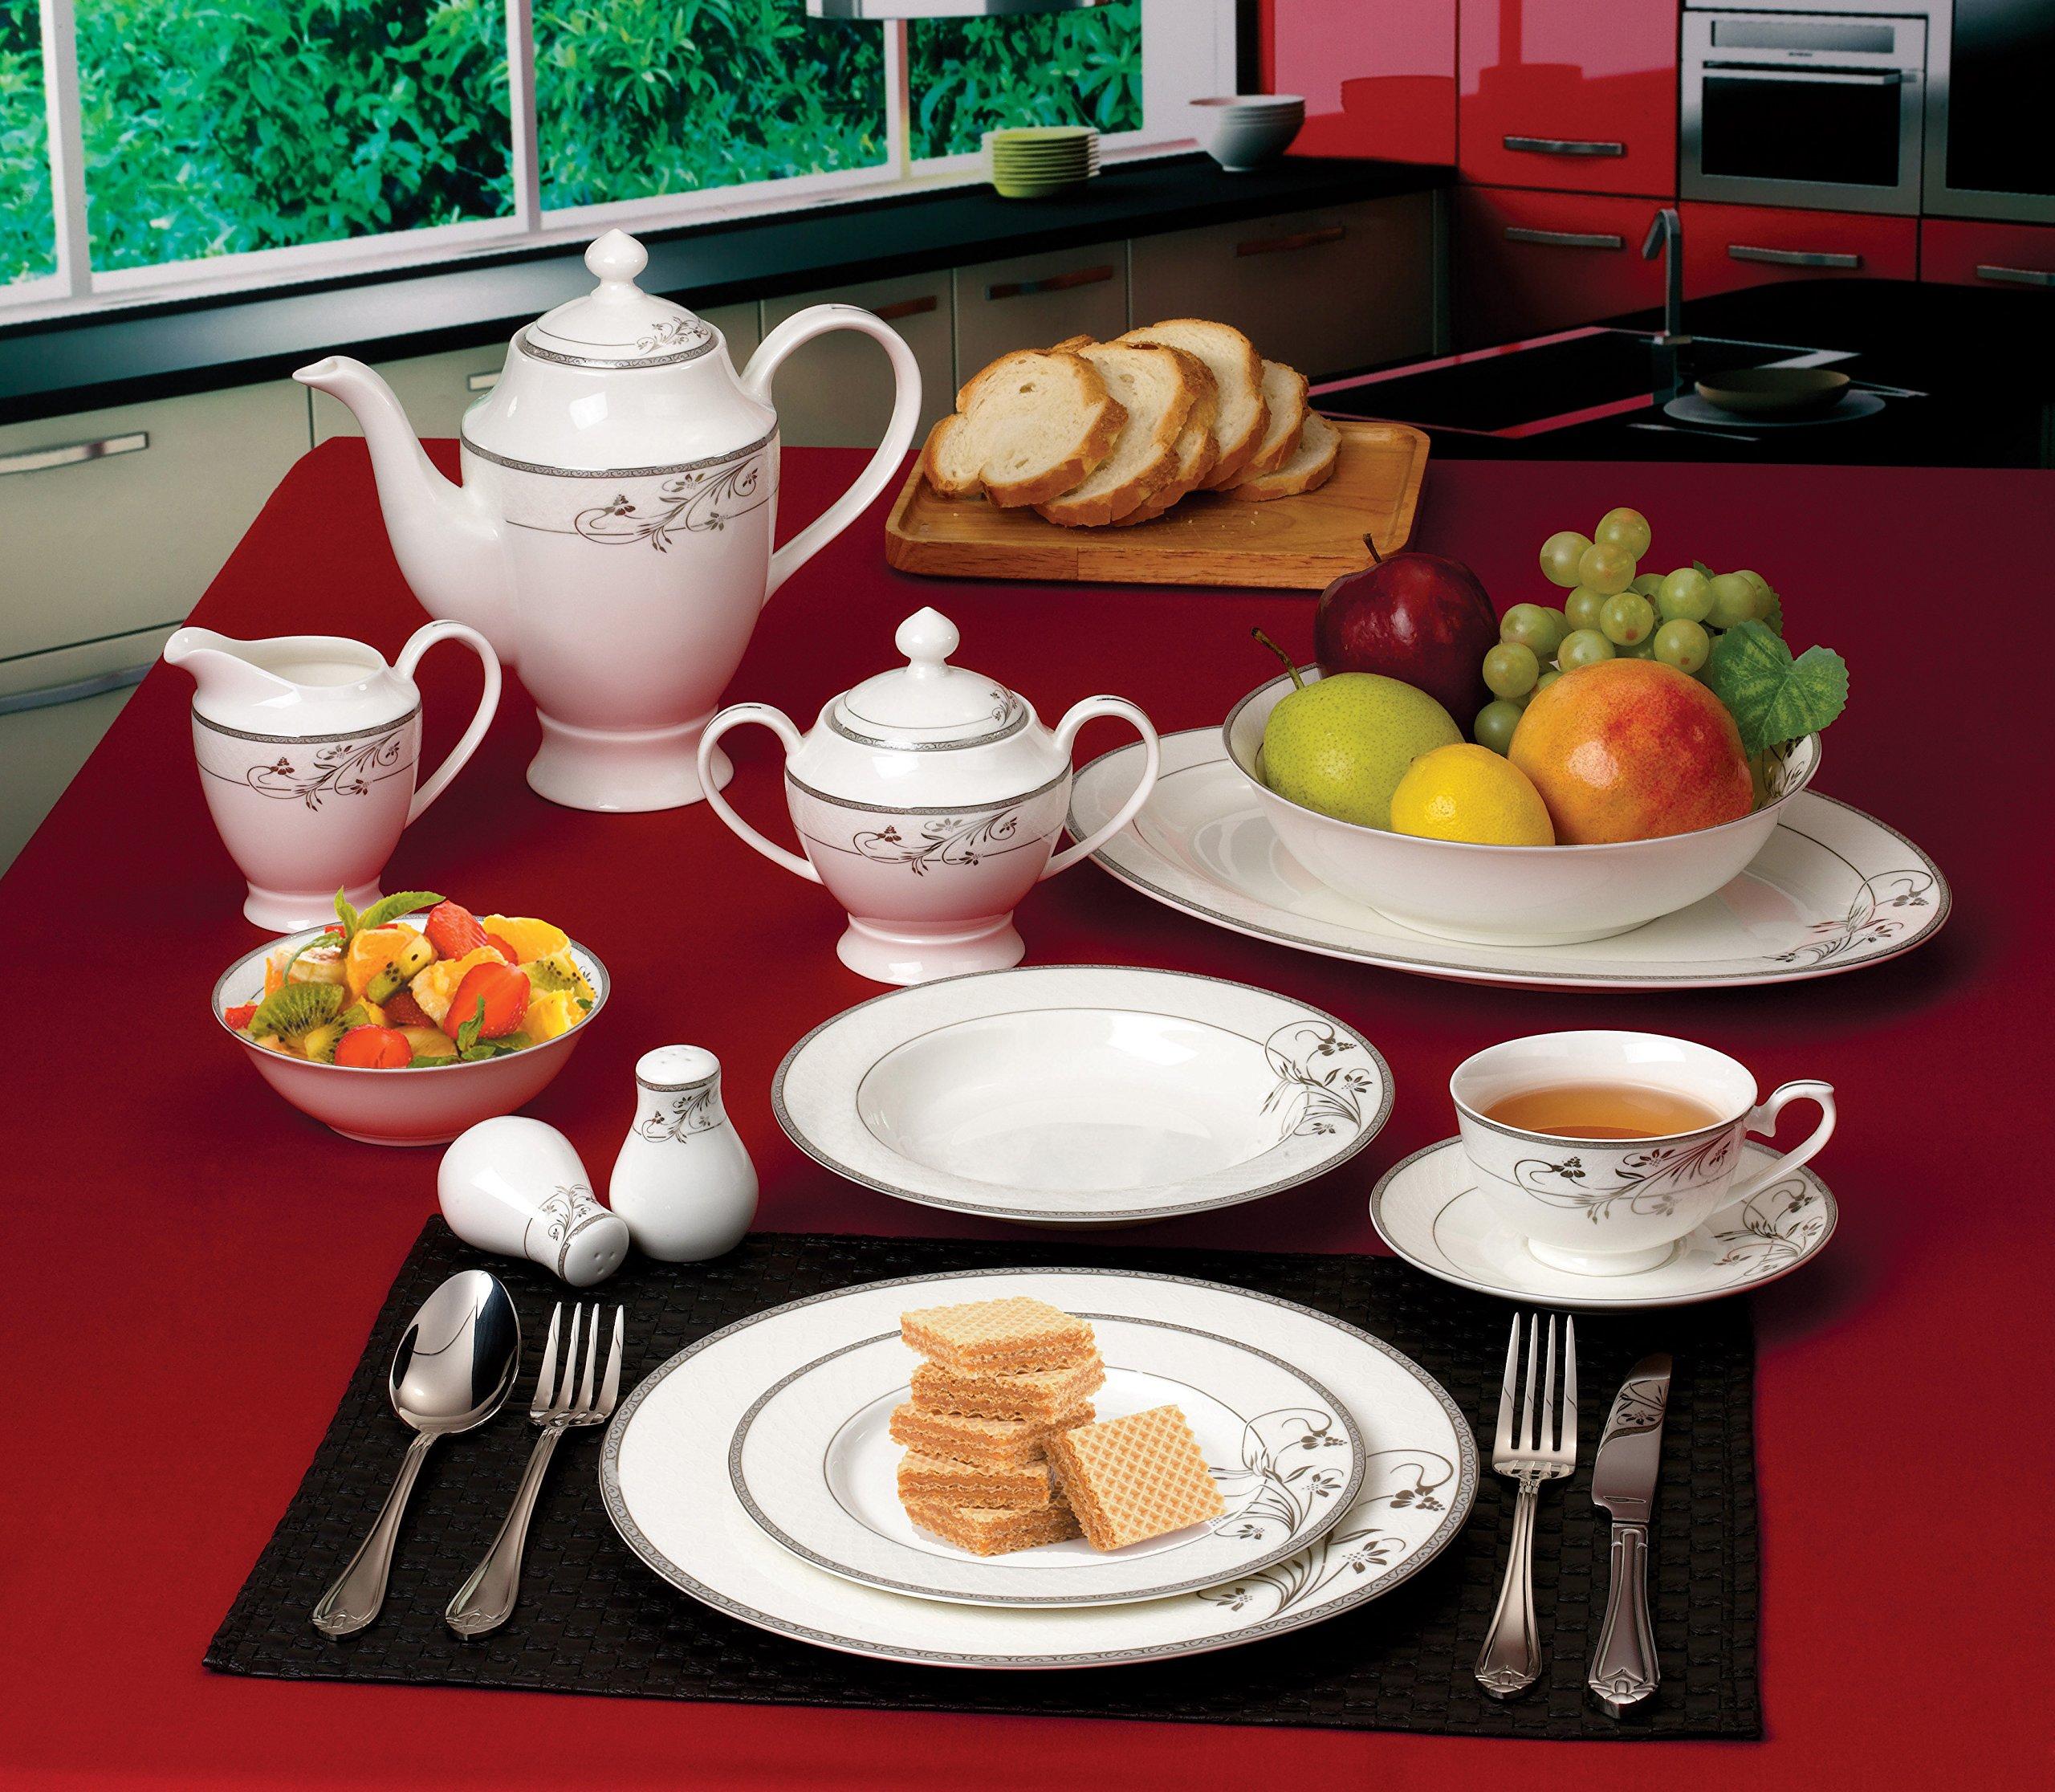 Lorenzo 57 Piece Elegant Bone China Service for 8 Viola Dinnerware Sets, Silver - 6 Piece Place Setting Translucent Bone China Includes Serving Pieces - kitchen-tabletop, kitchen-dining-room, dinnerware-sets - 91paR6Z3AsL -